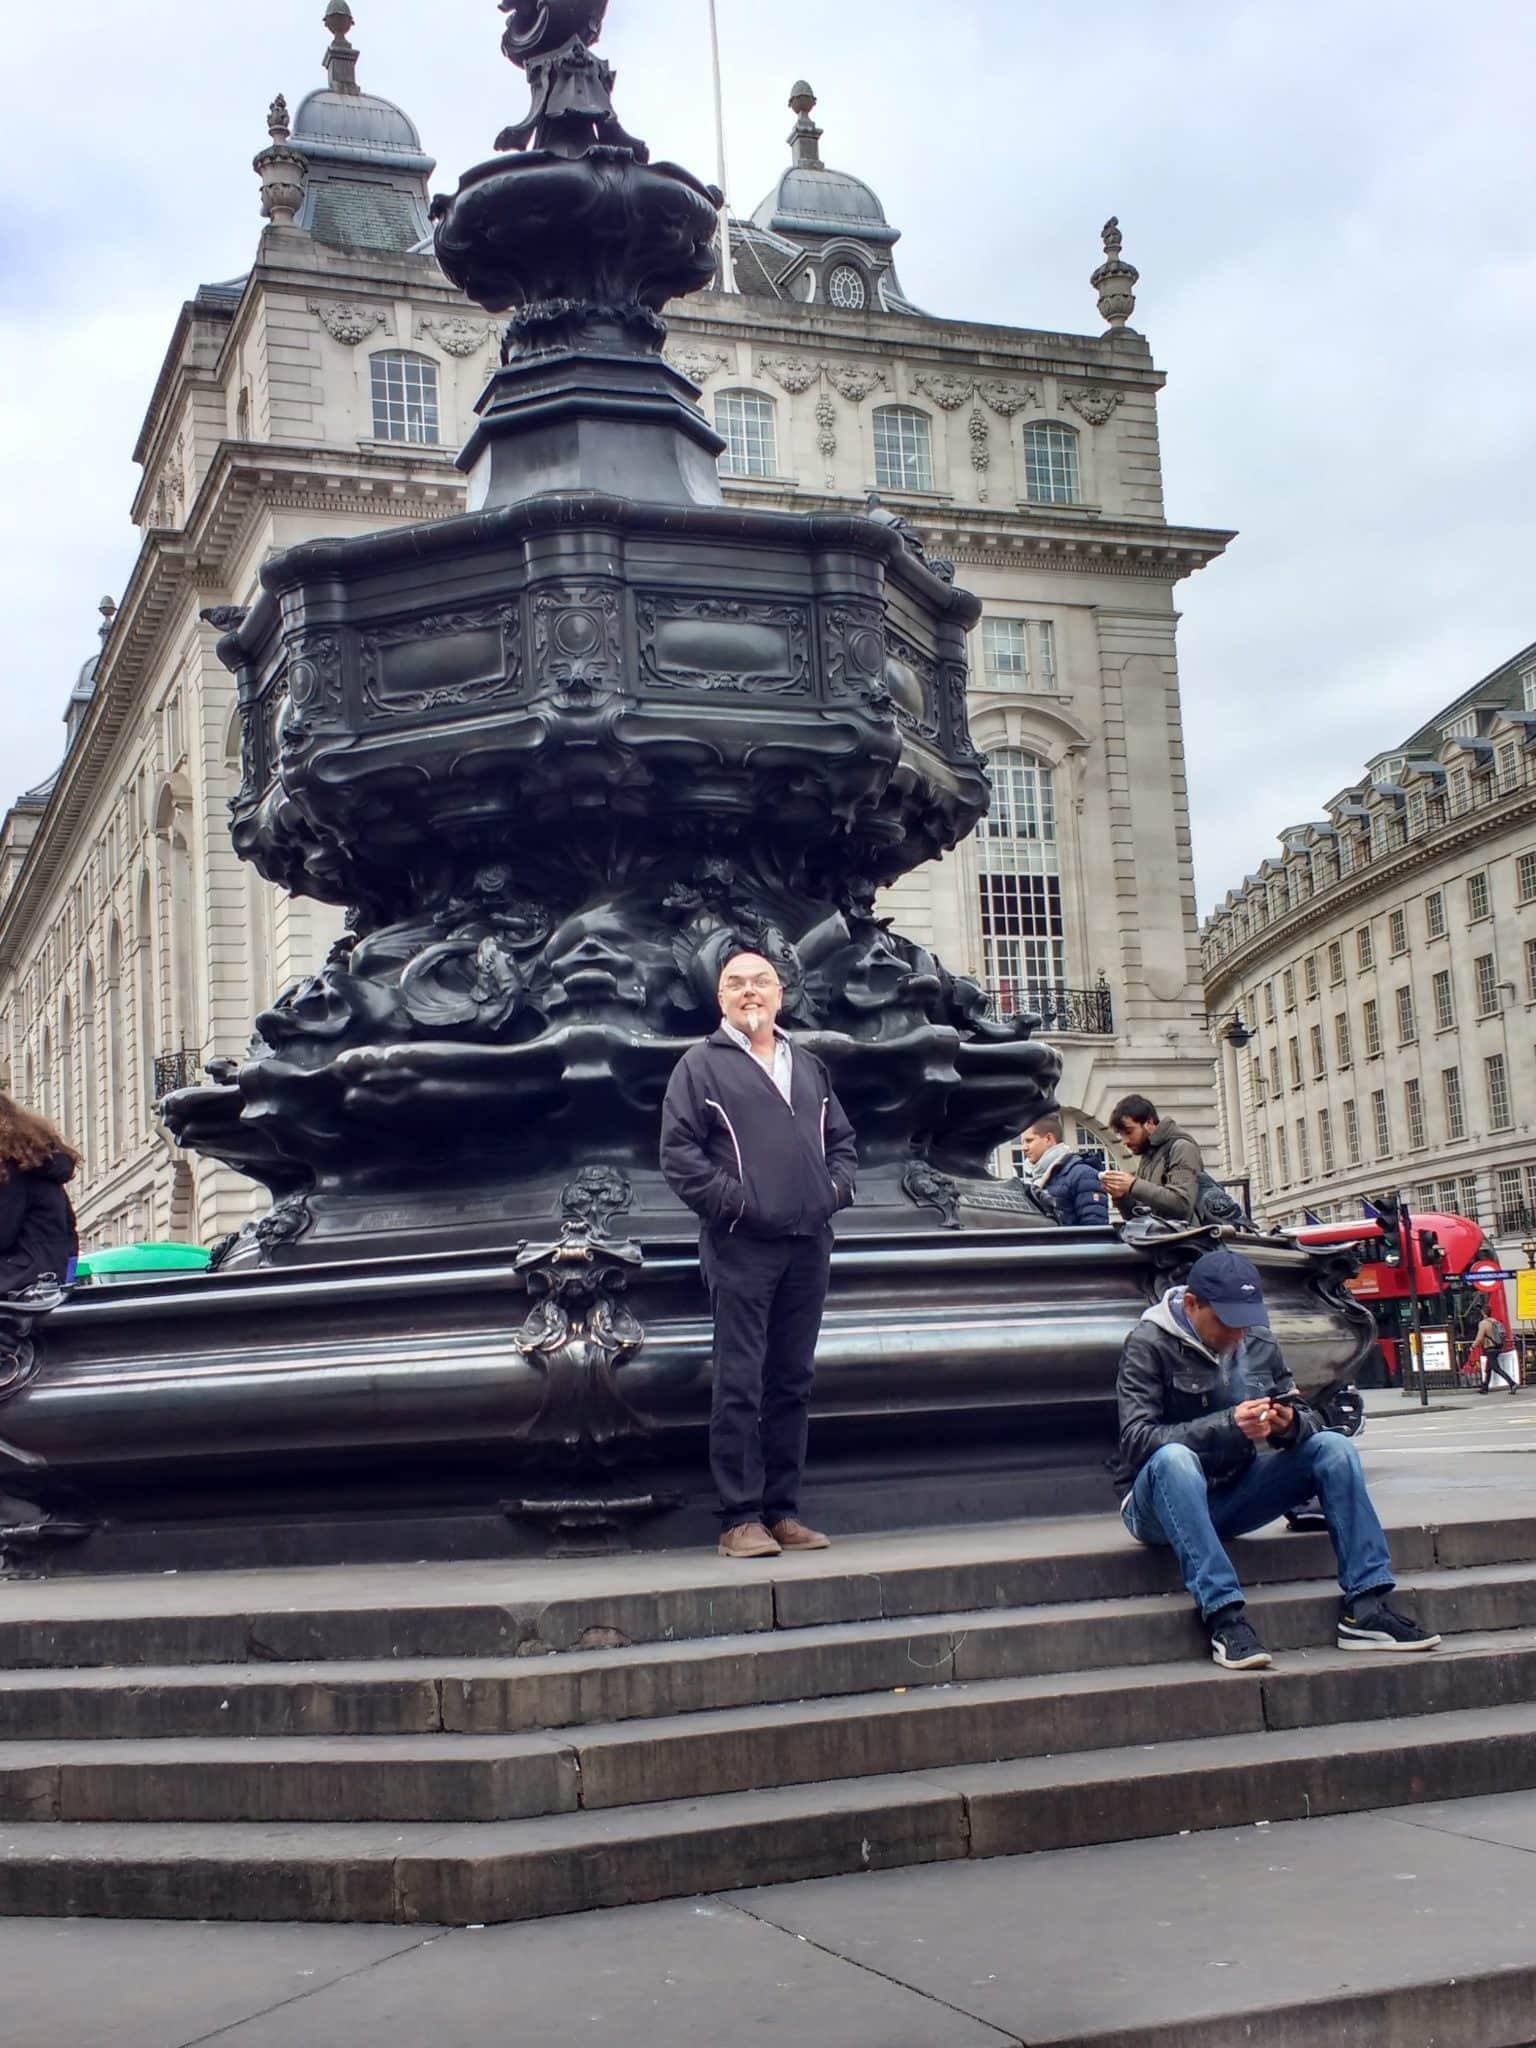 Visiting the extraordinary Trafalgar Square lions